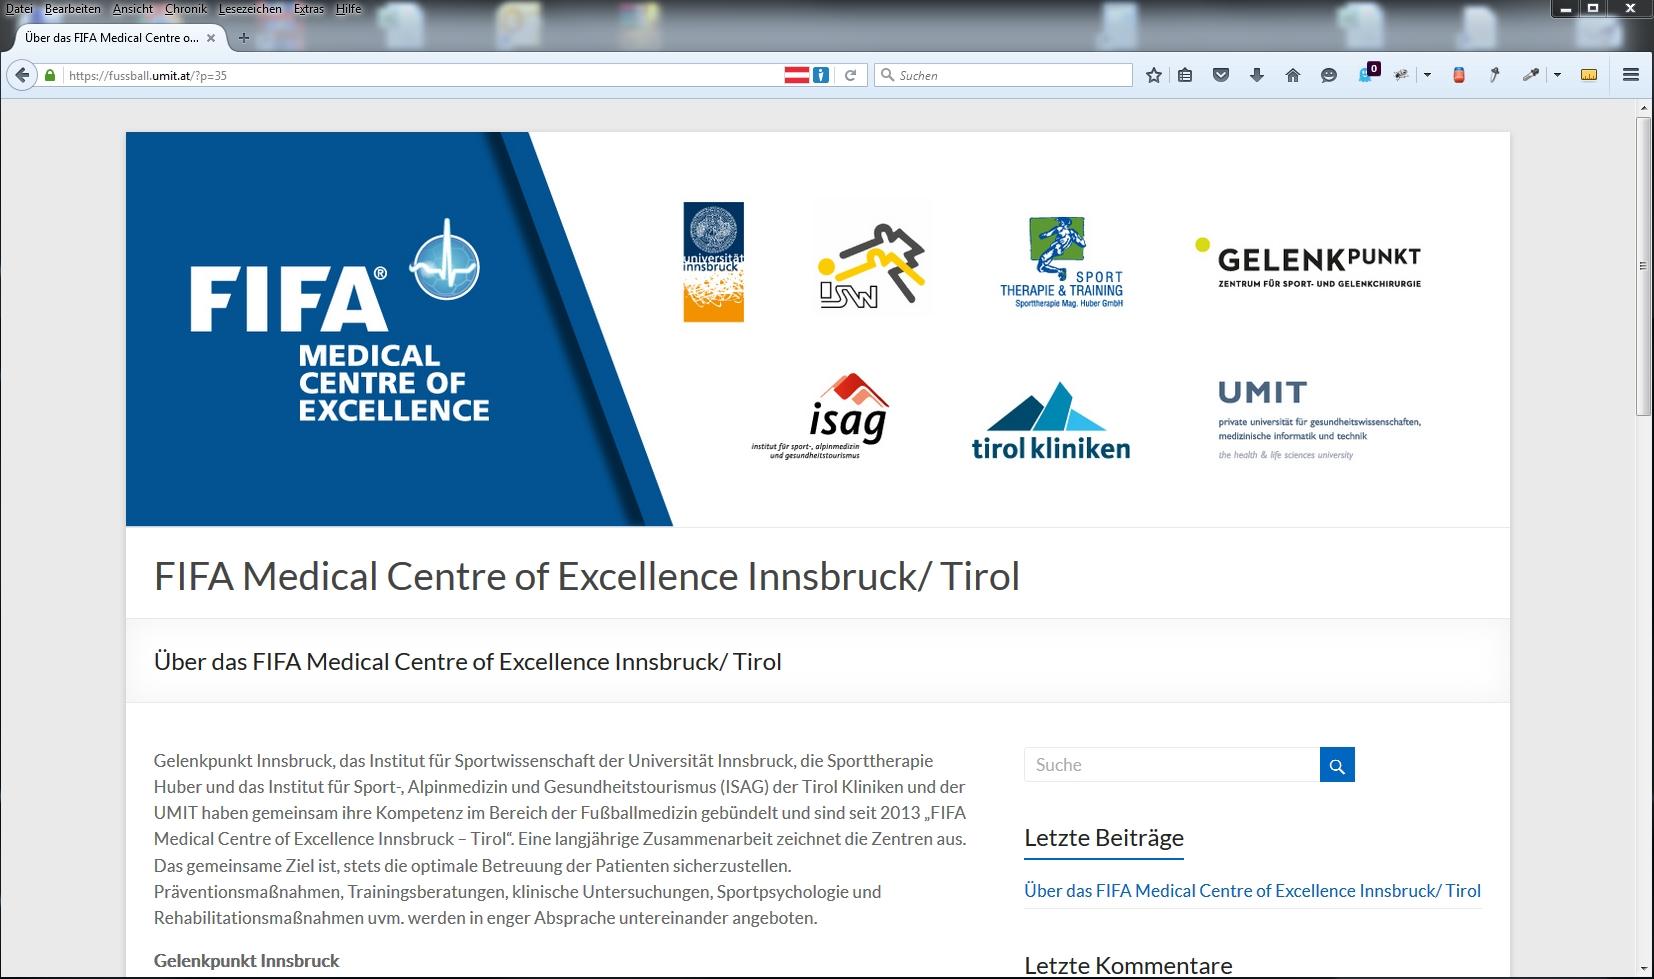 FIFA Medical Centre of Excellence Innsbruck